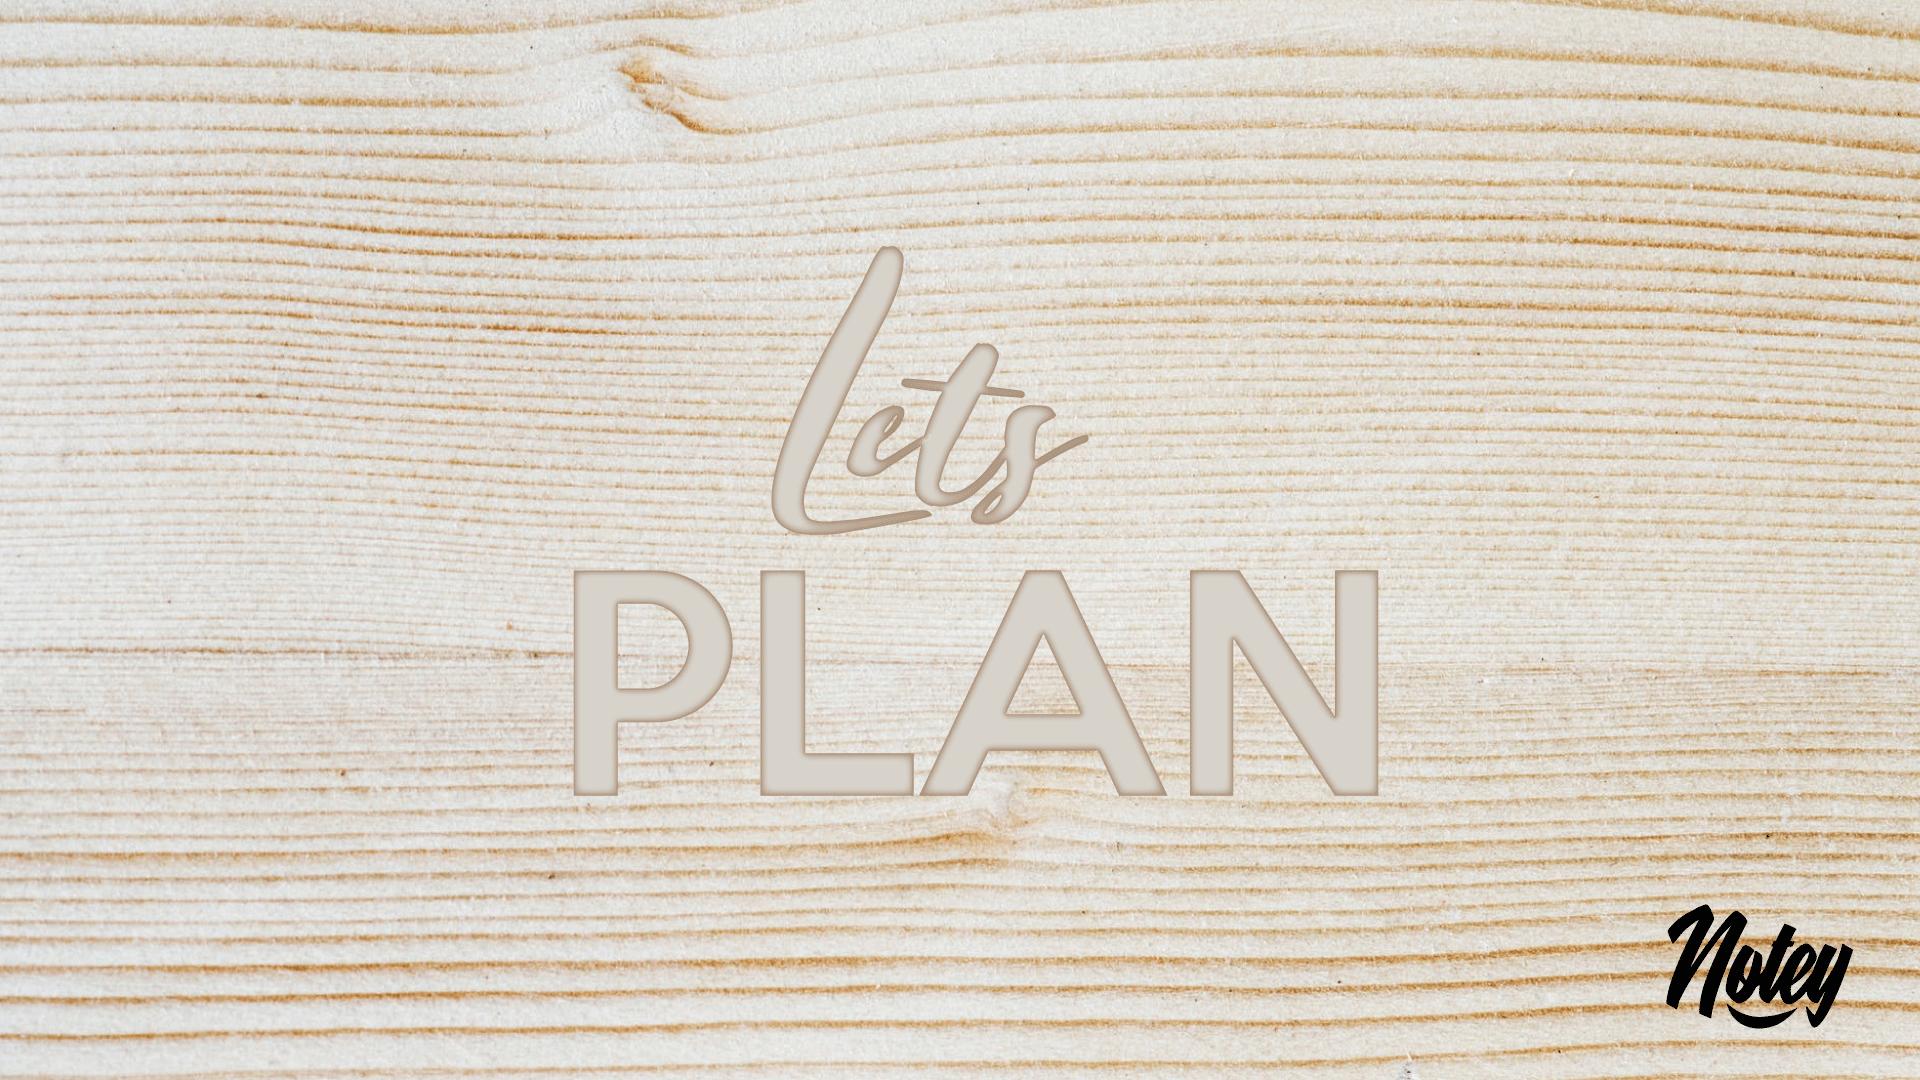 Let's Plan!